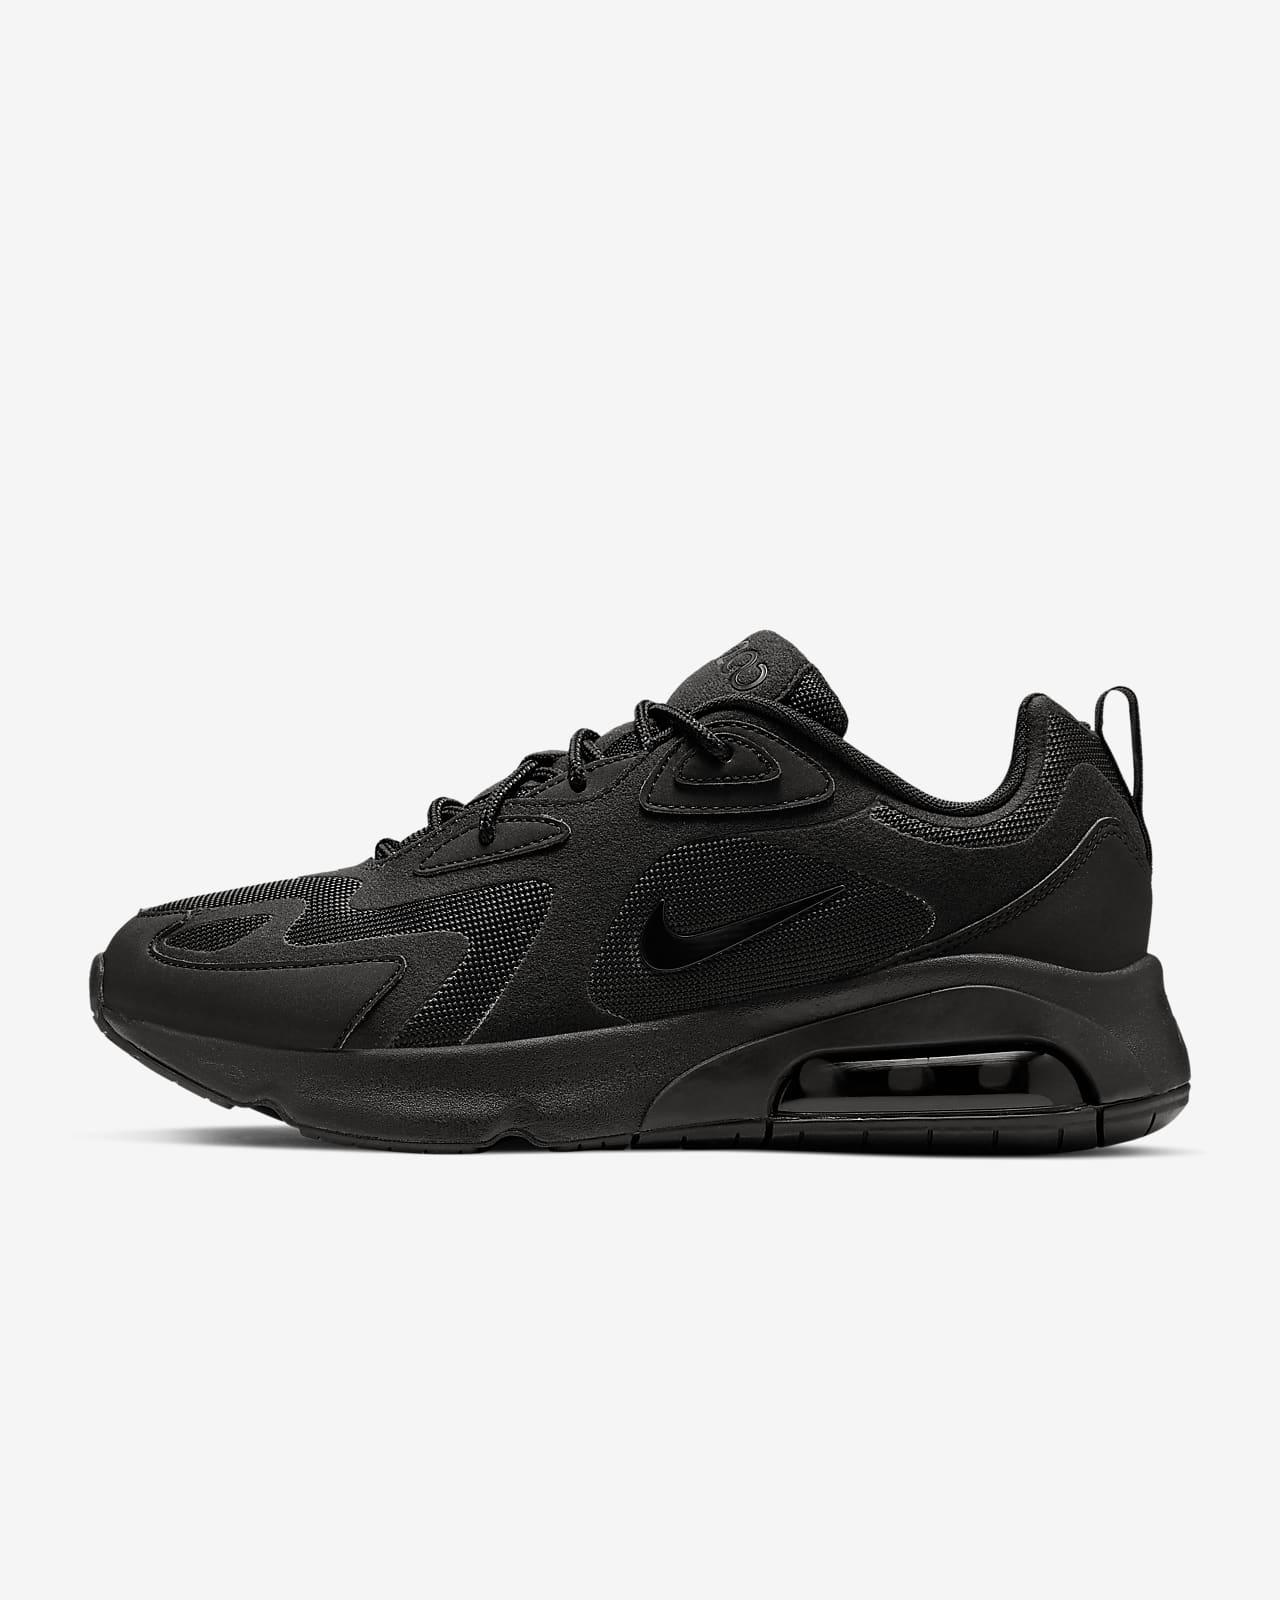 Nike Air Max 200 Shoe